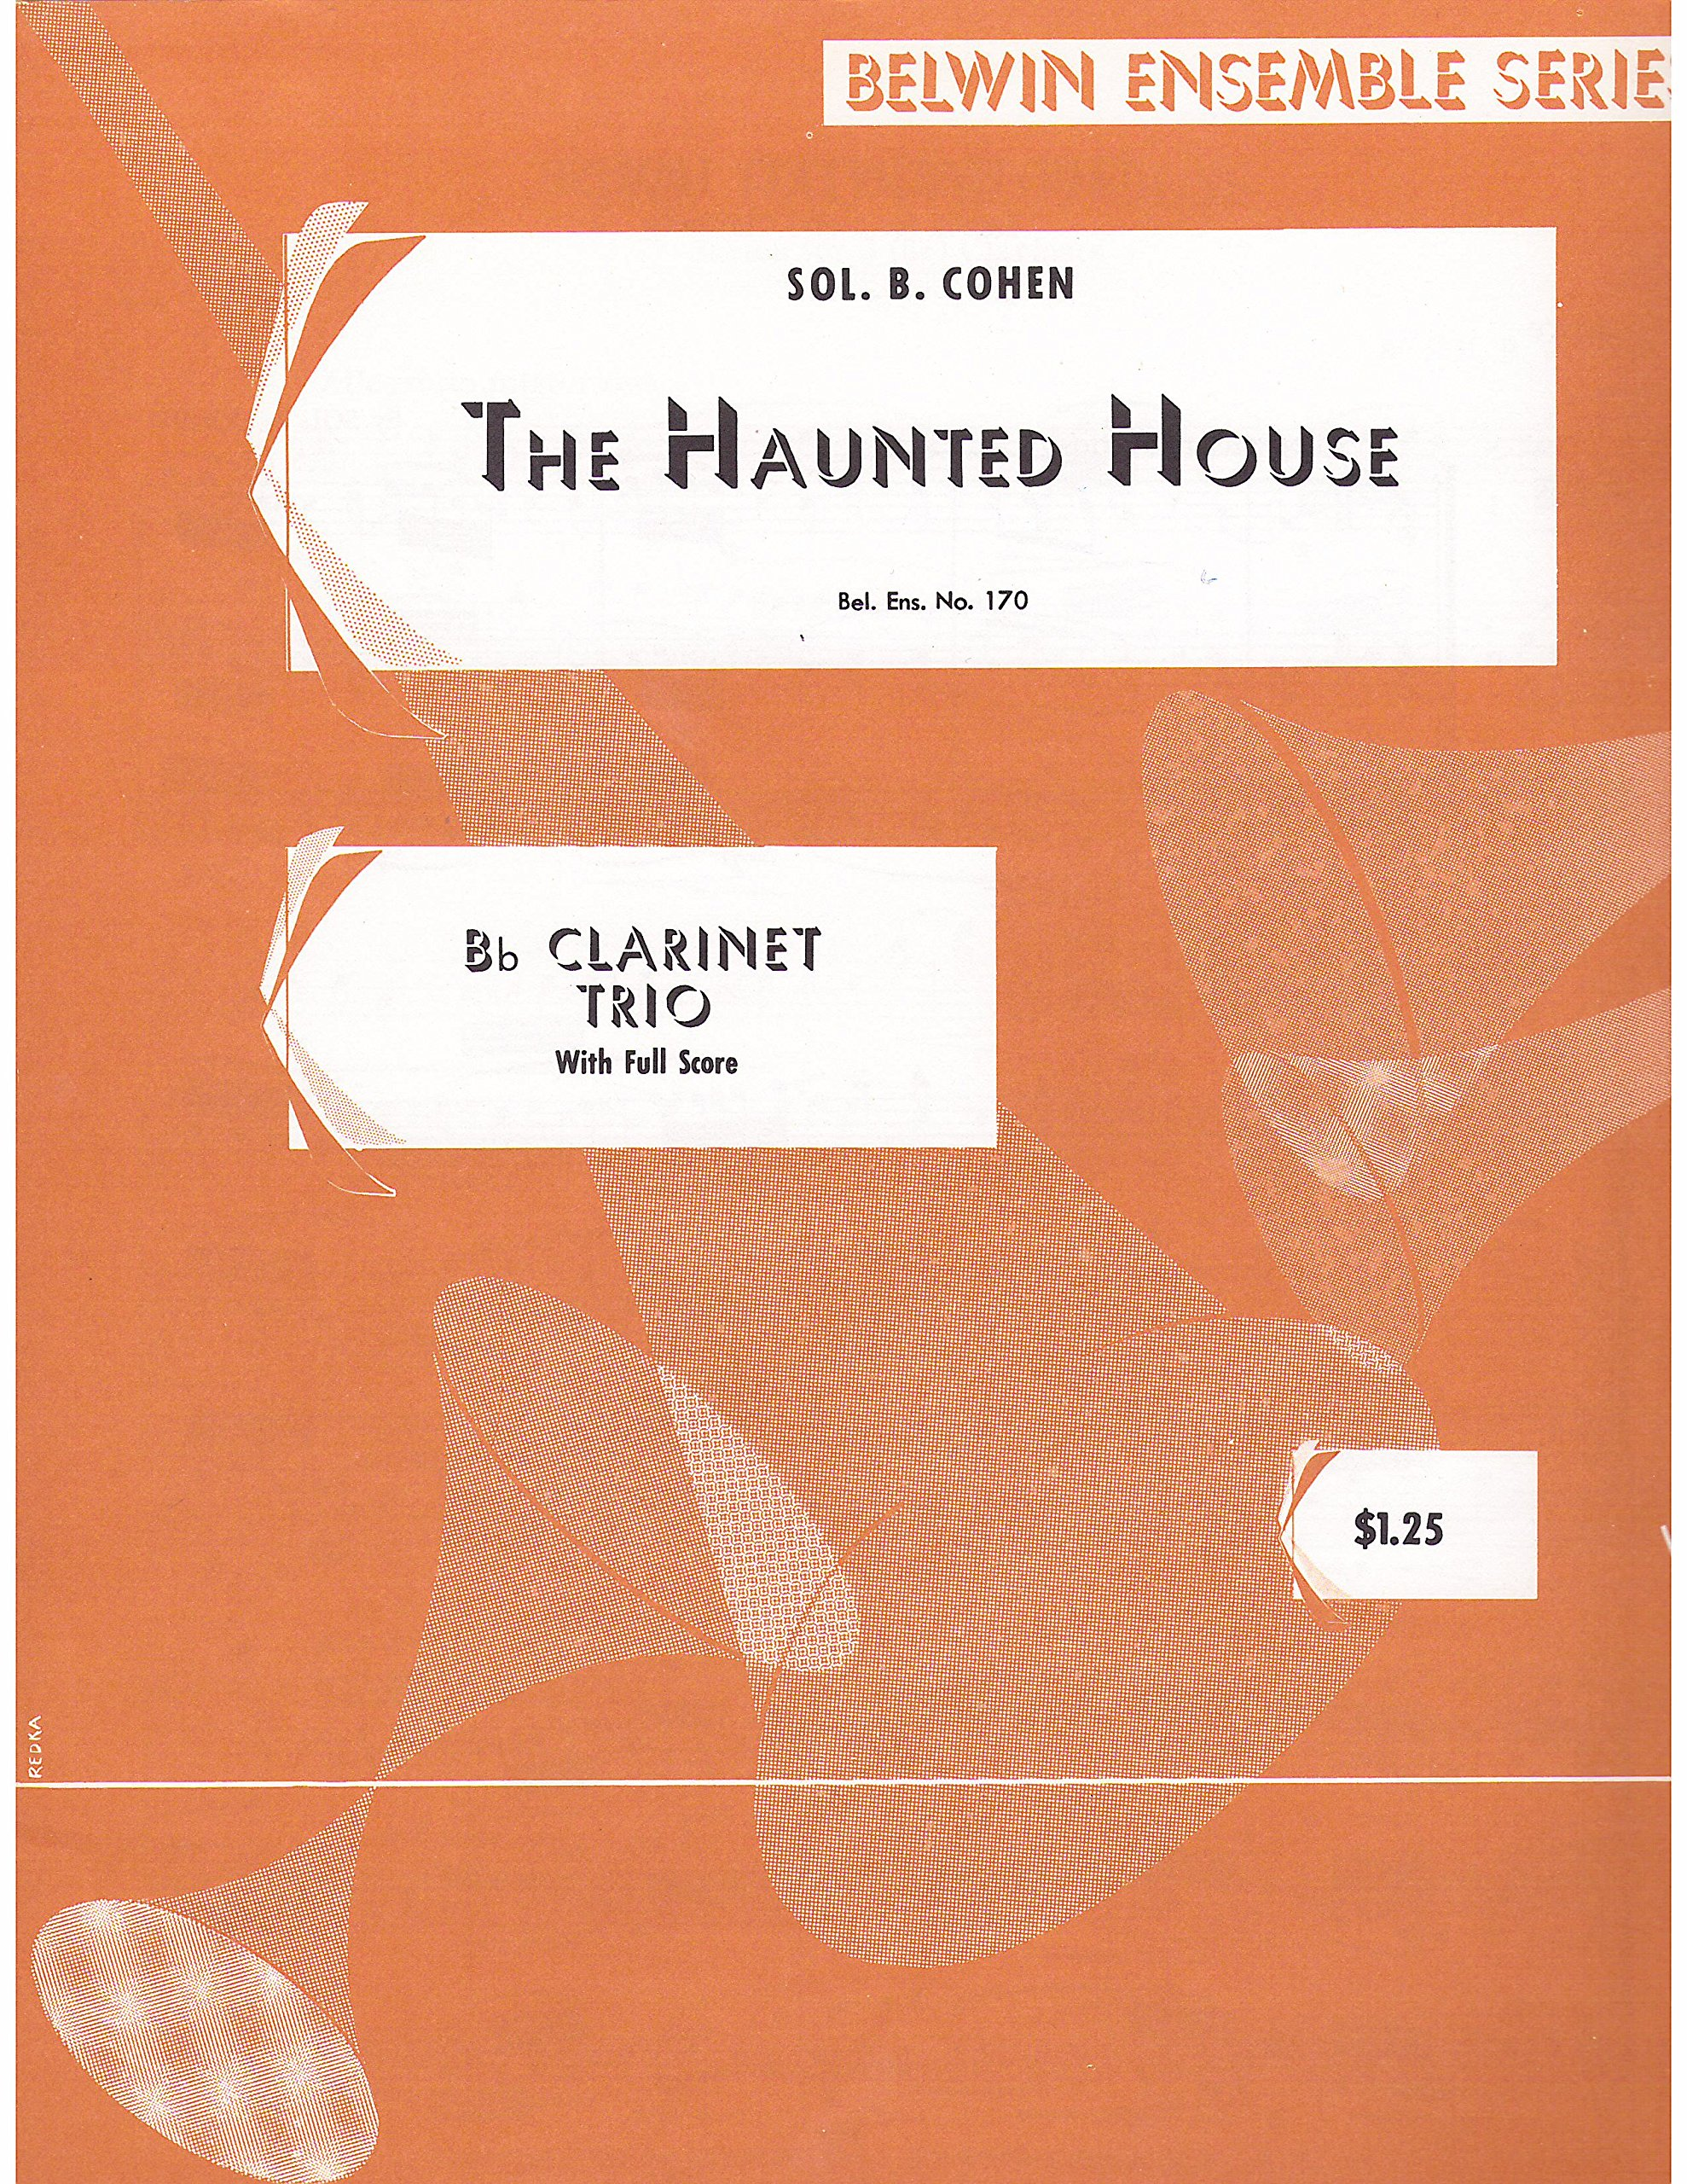 Amazon.com: The Haunted House - Bb Clarinet Trio with Full Score: Sol. B.  Cohen: Books